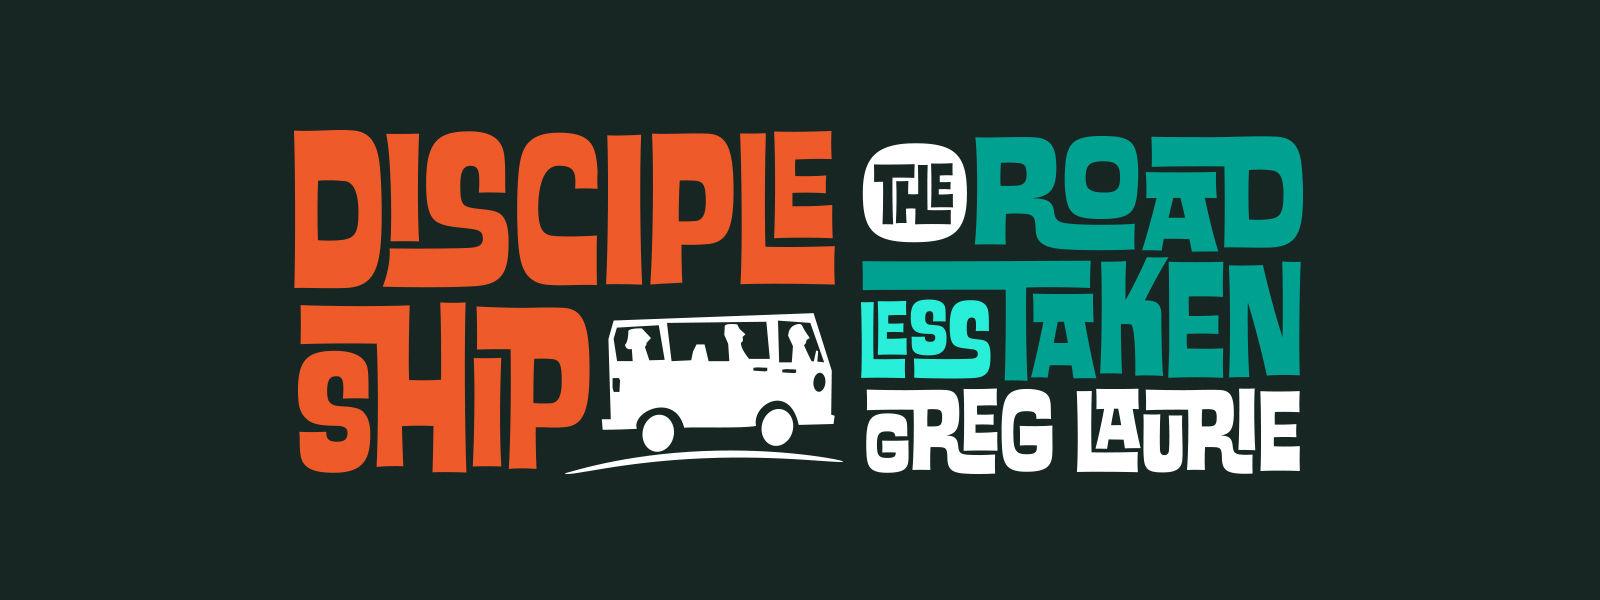 Discipleship: The Road Less Taken